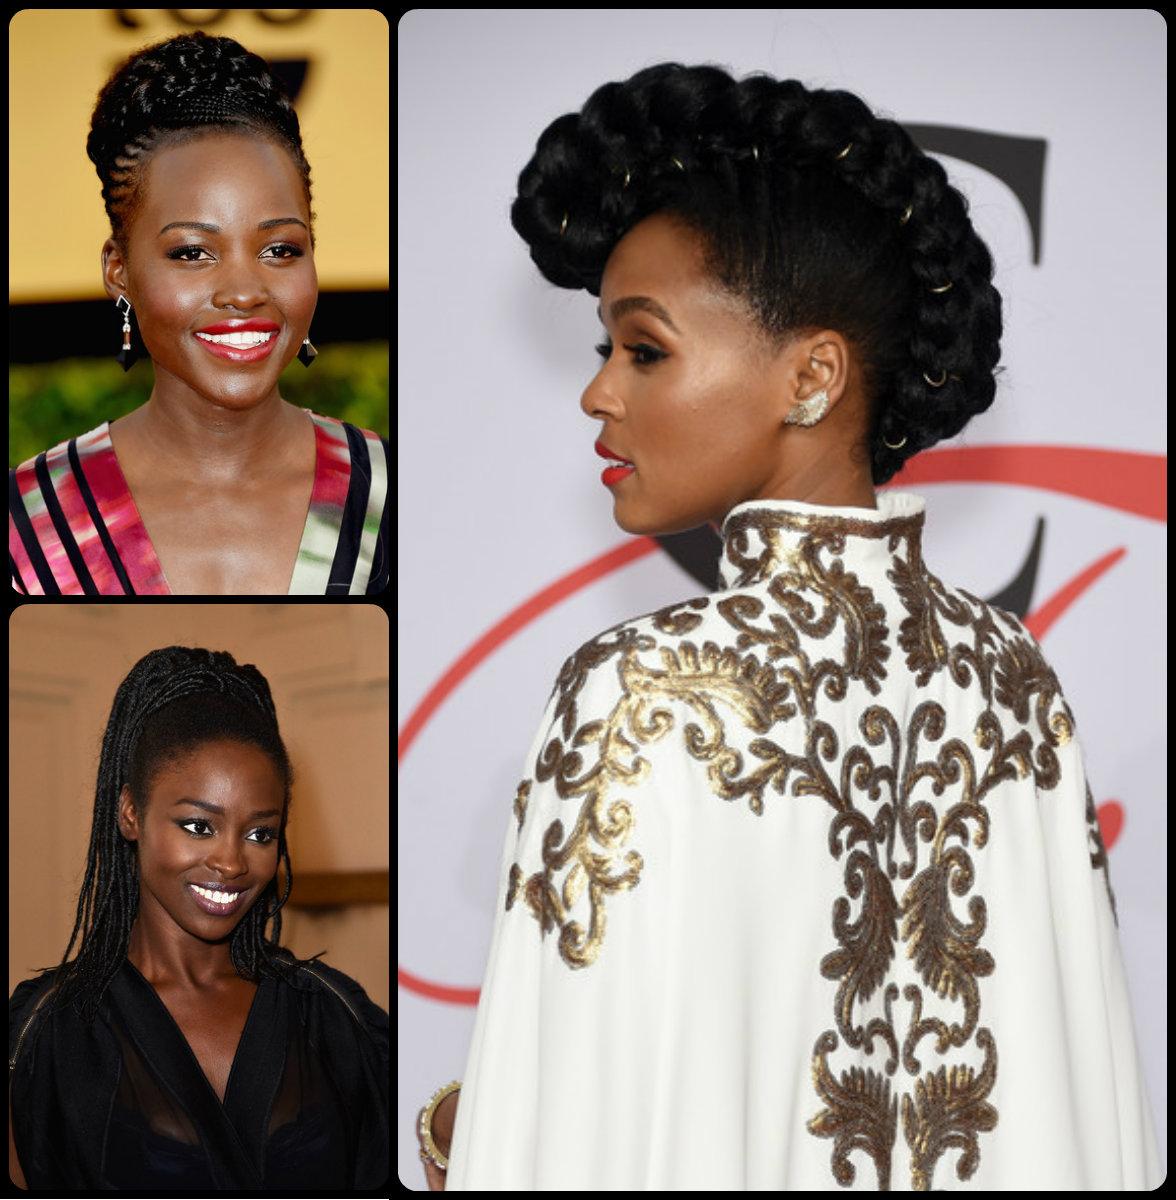 Remarkable Black Women Braided Updos 2015 Summer Hairstyles 2016 Hair Short Hairstyles For Black Women Fulllsitofus